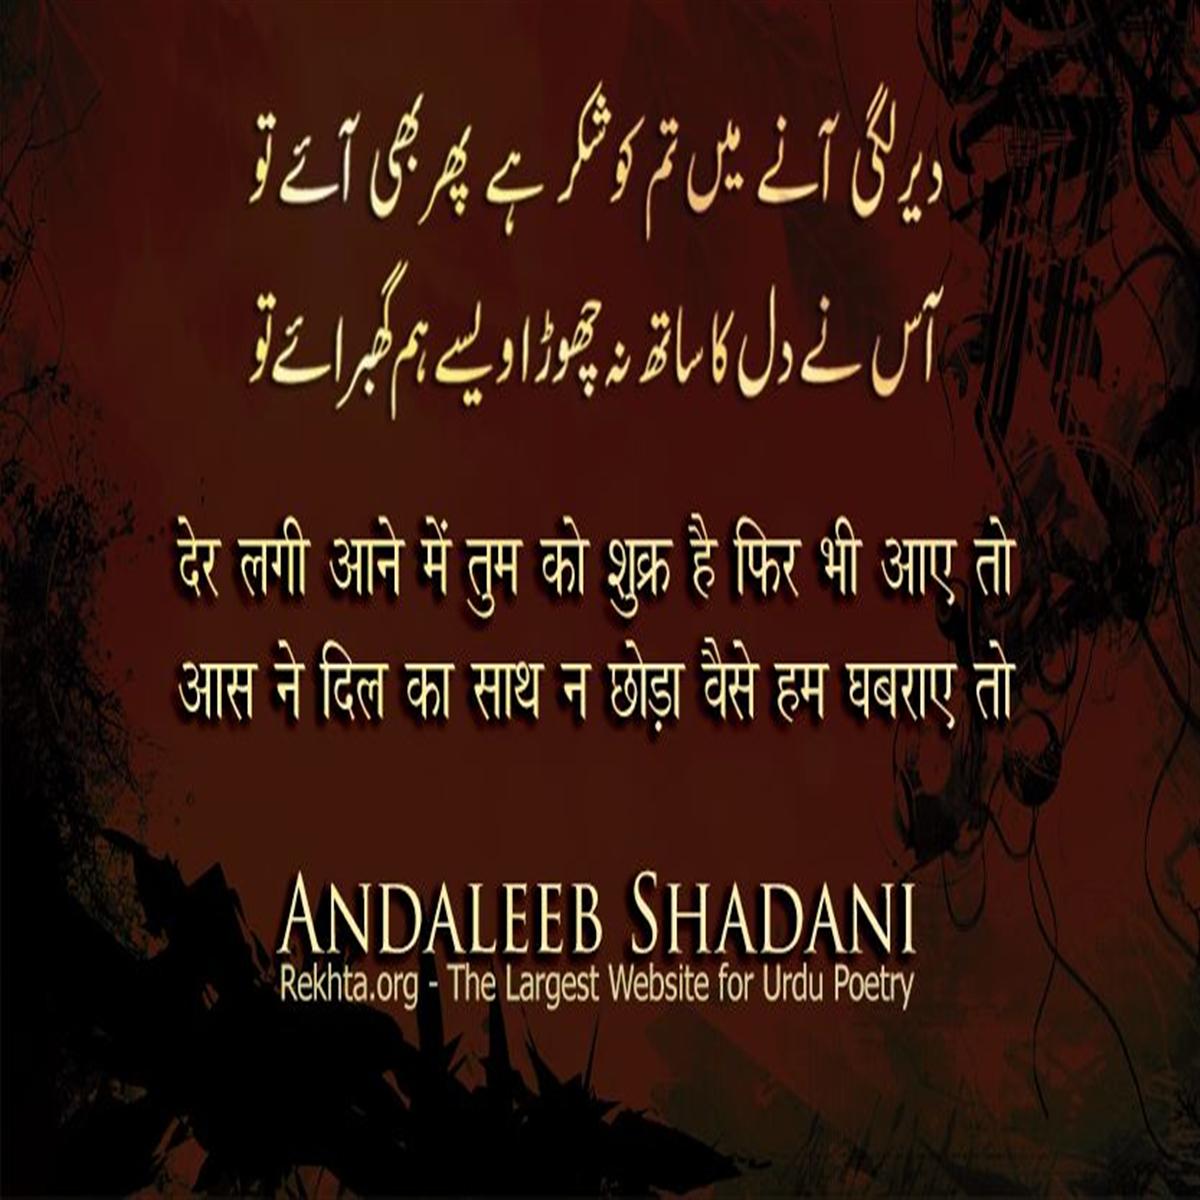 der lagii aane me.n tum ko shukr hai phir bhii aa.e to-Andaleeb Shadani